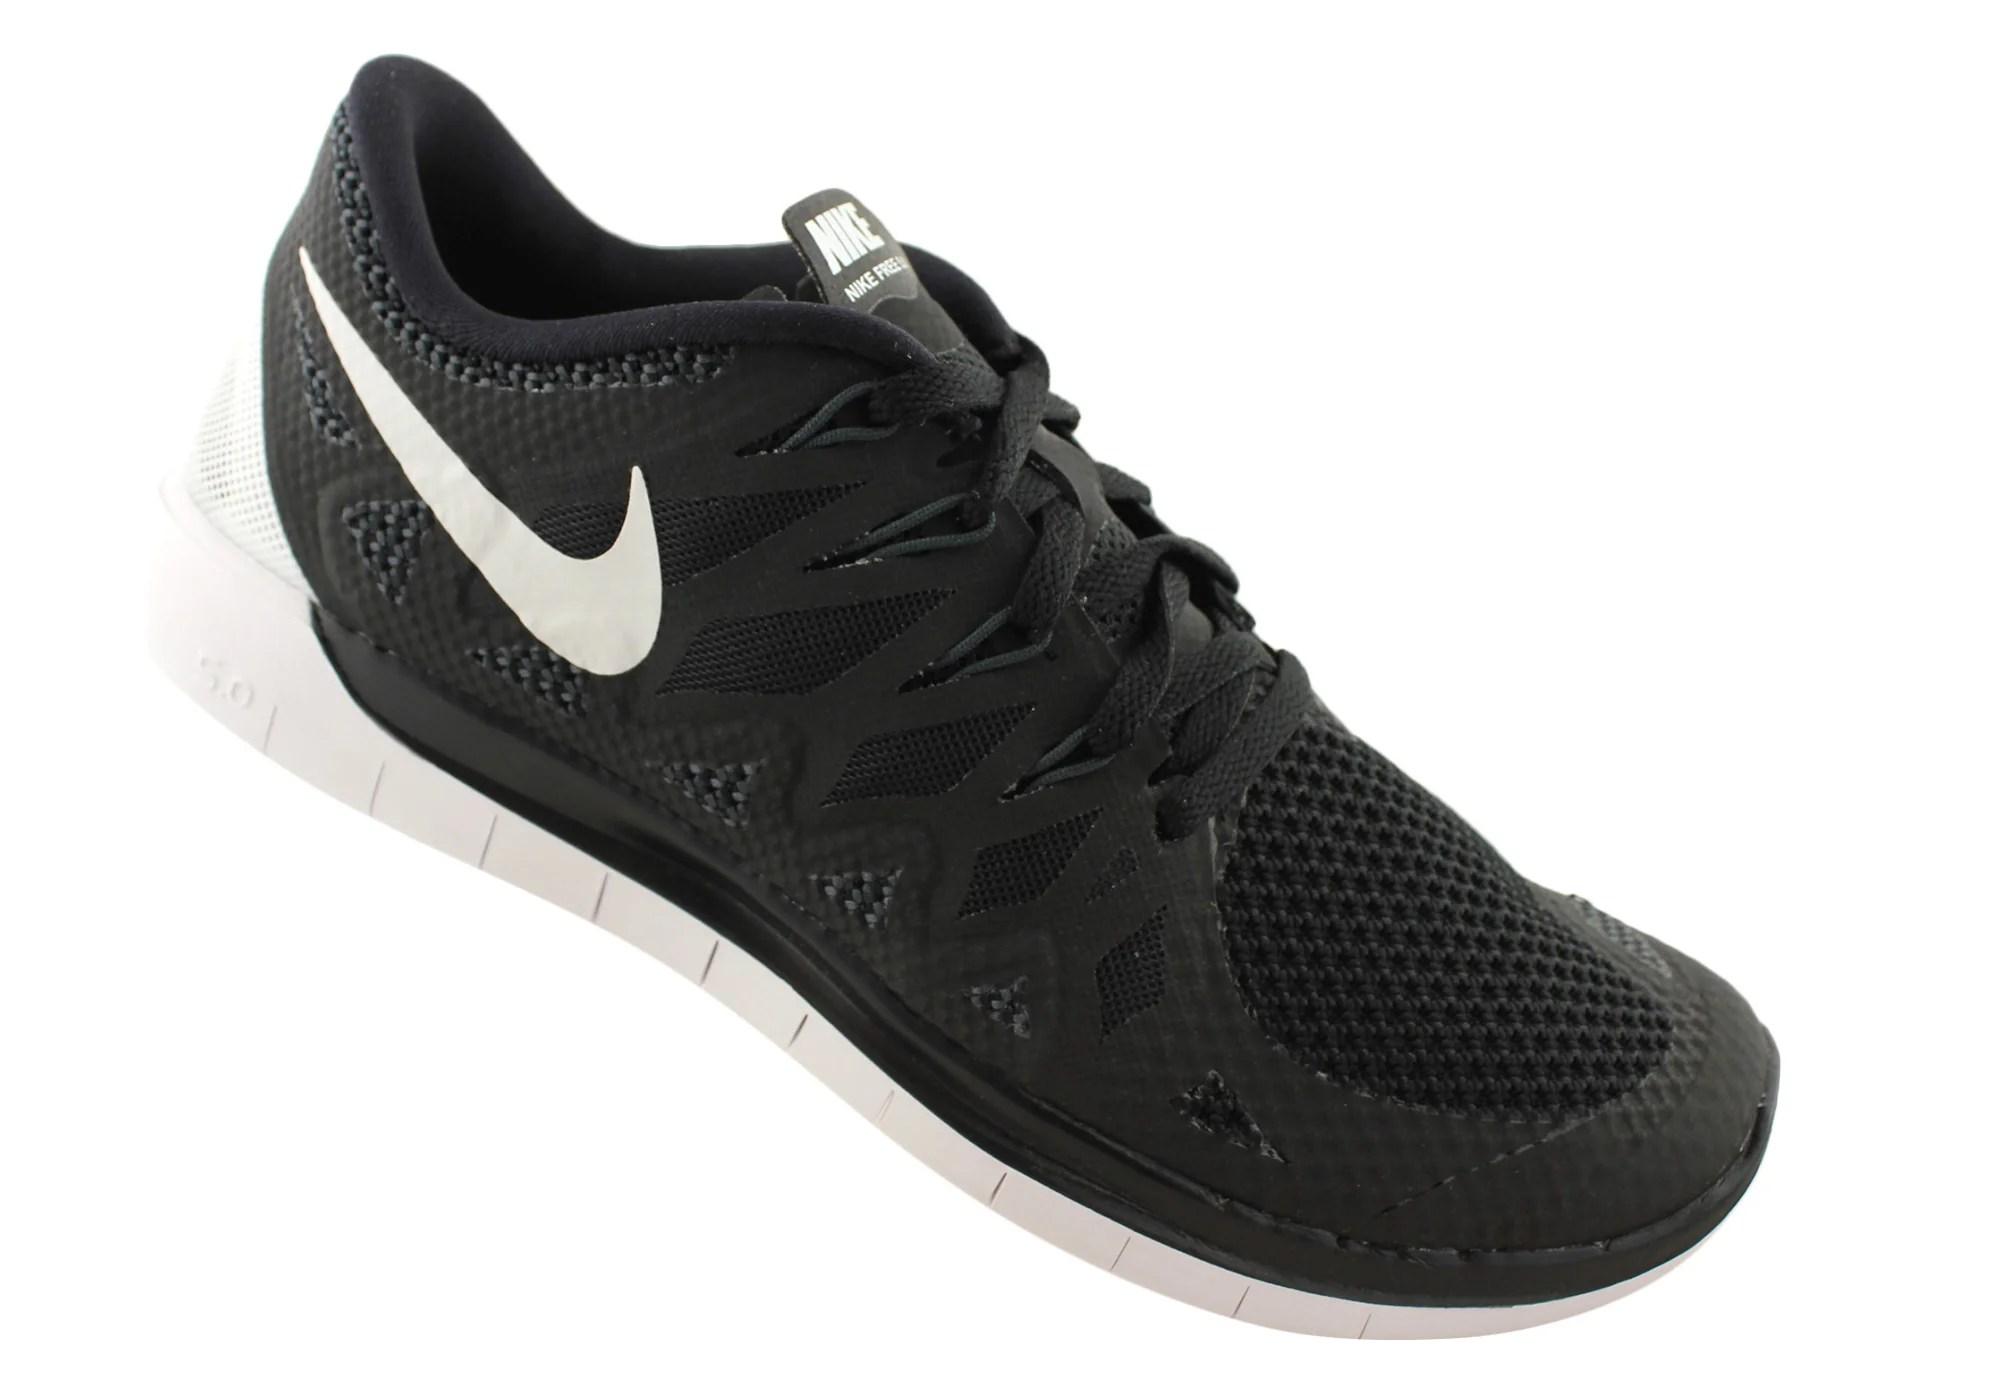 Nike Free Barefoot Running Shoes